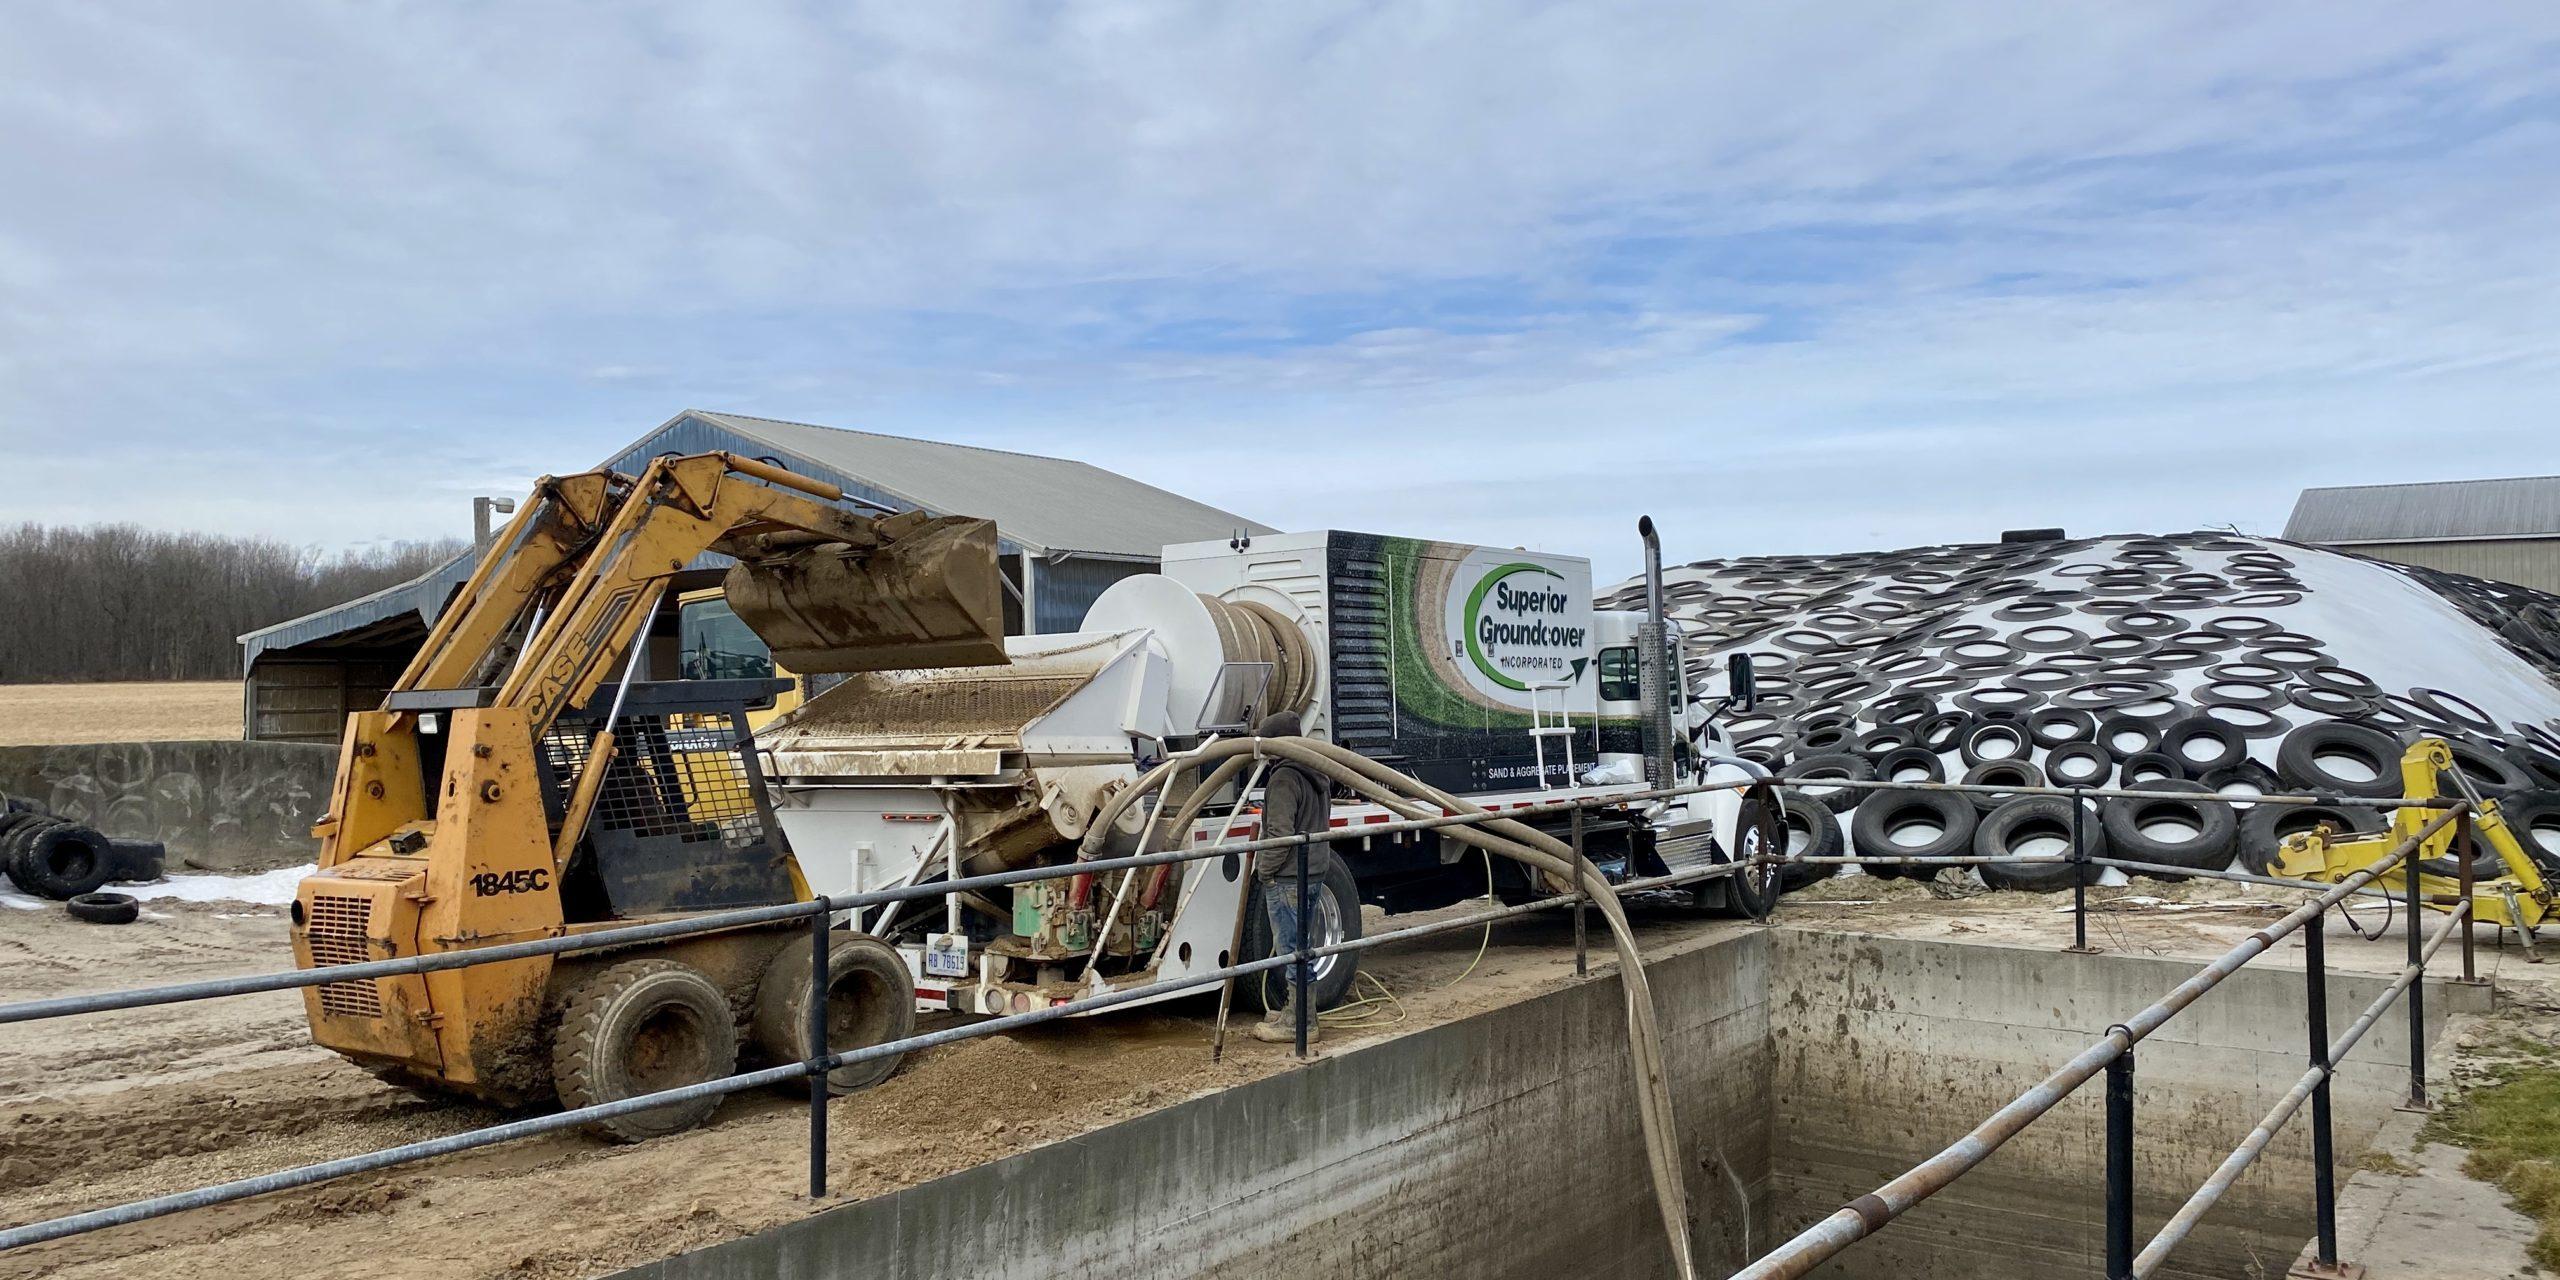 Stone blower truck installing peastone for a dairy farm in Michigan